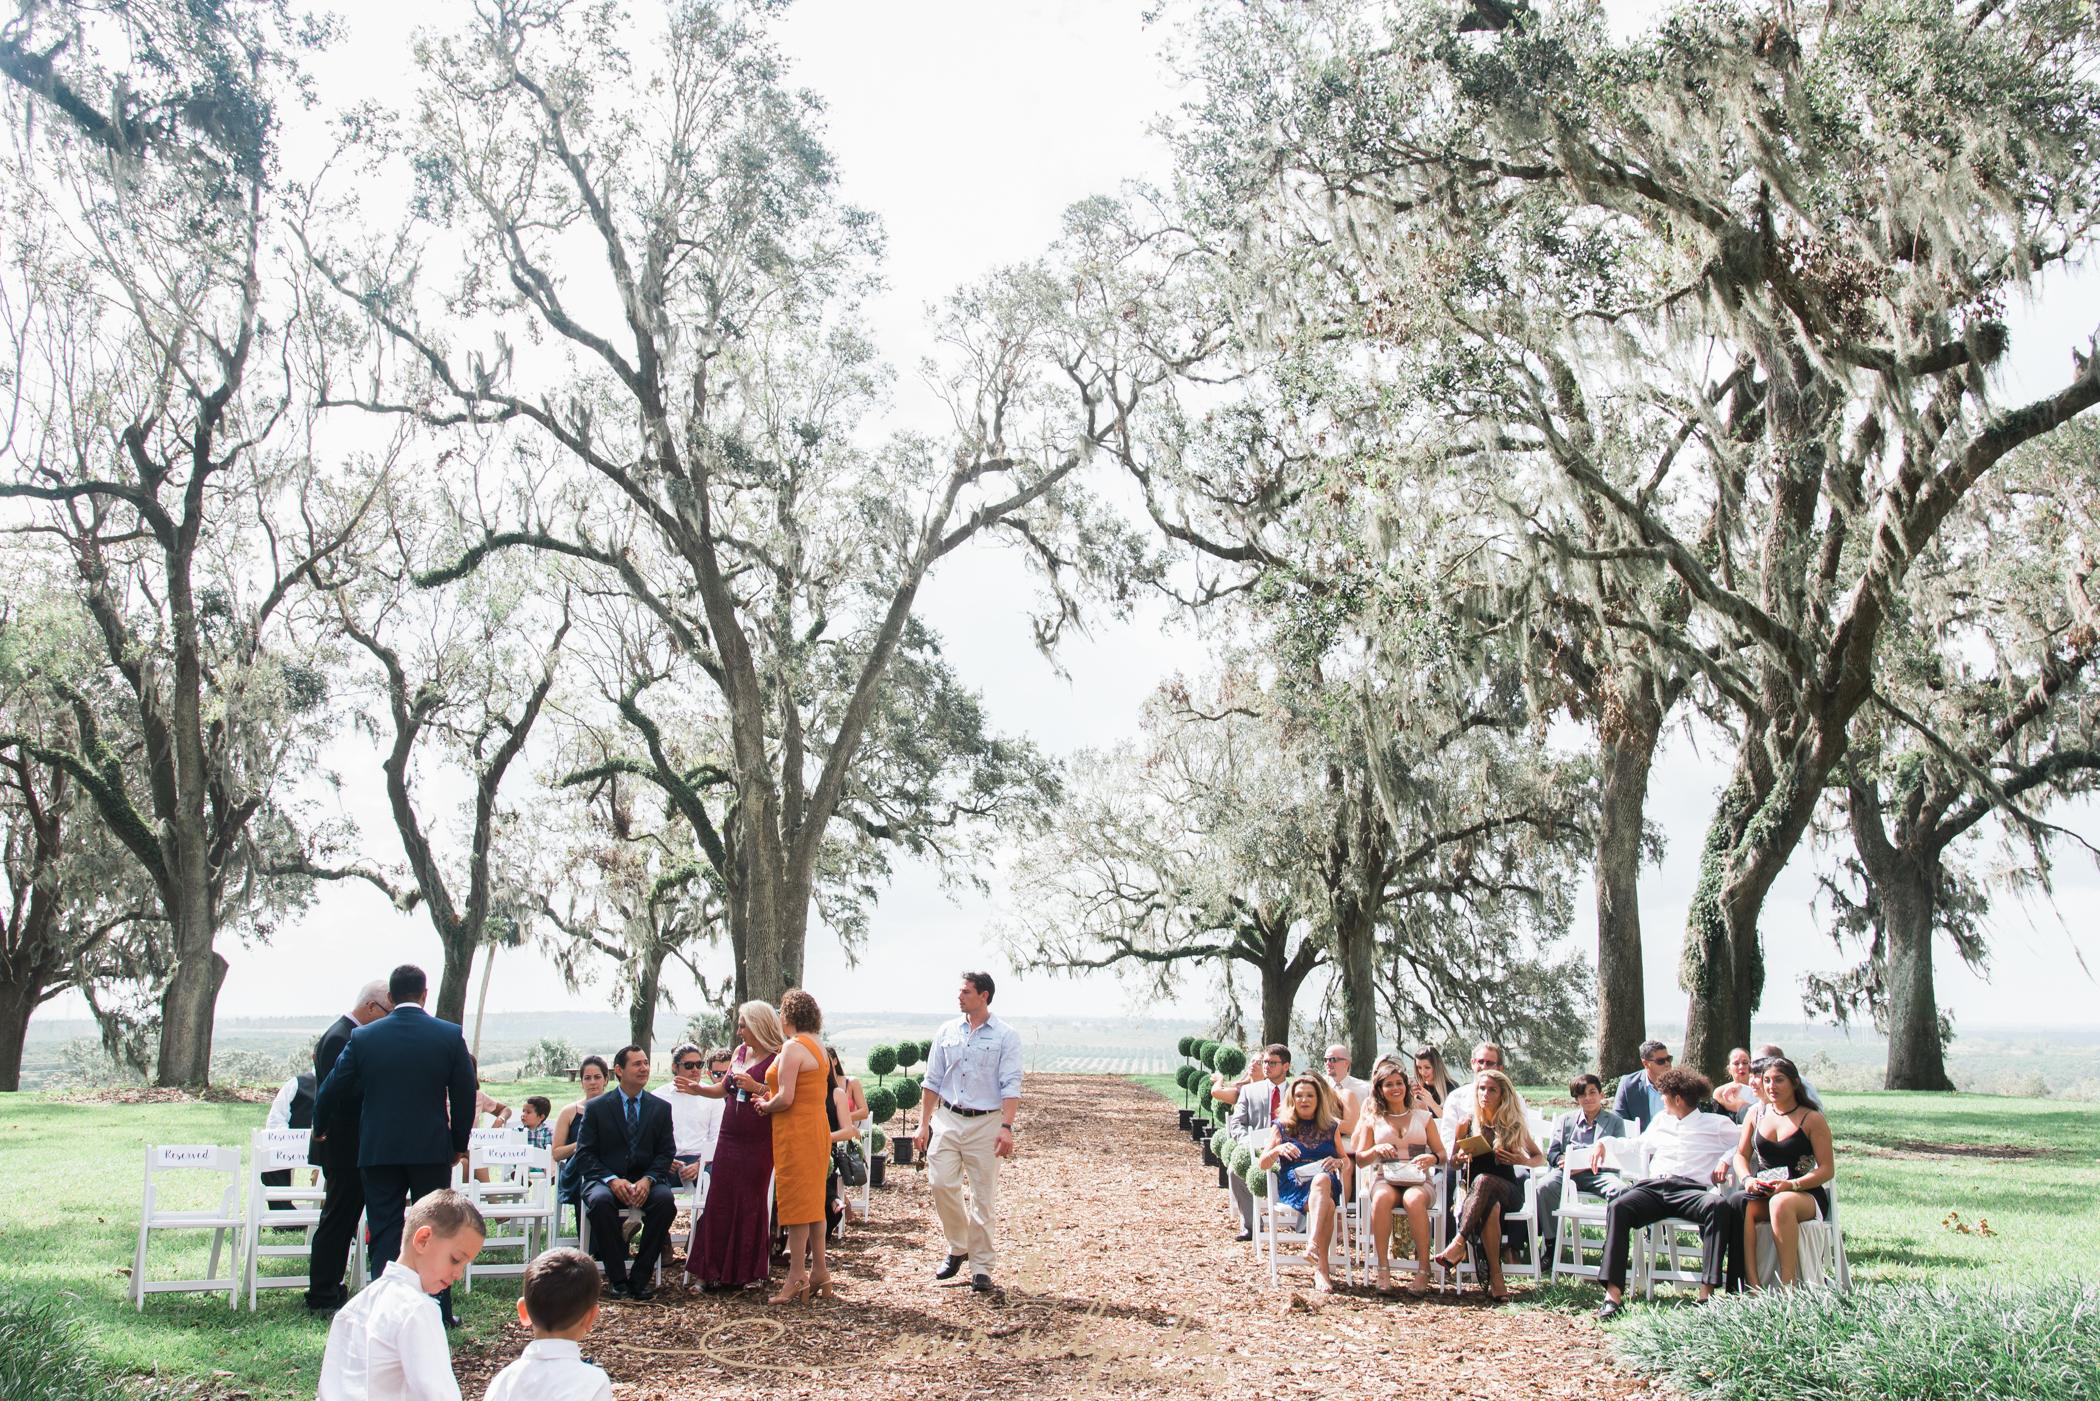 Bok-tower-gardens-ceremony-photo, Tampa-wedding-photographer